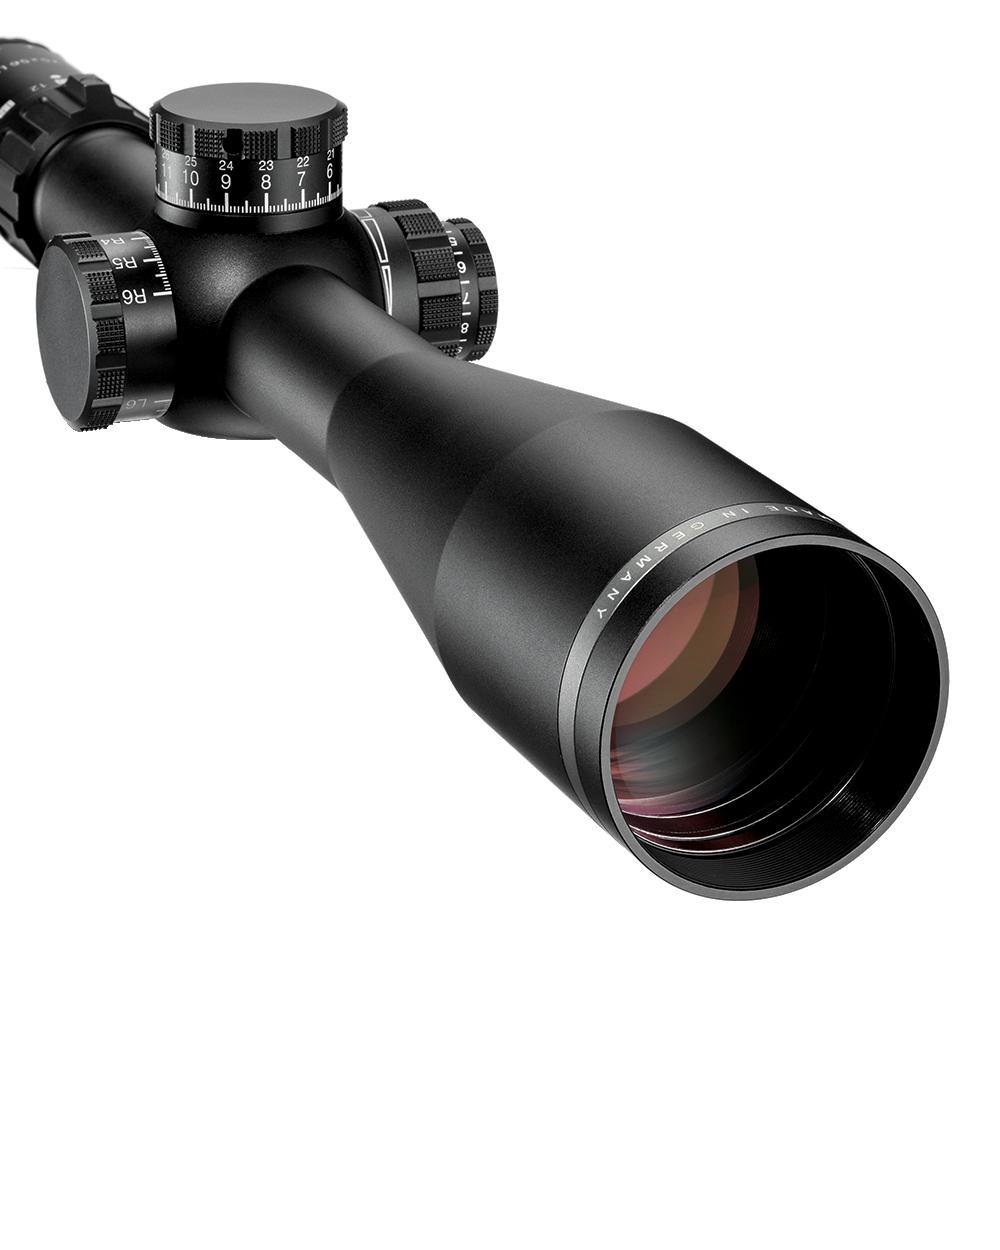 MINOX Riflescope Long Range 5-25x56